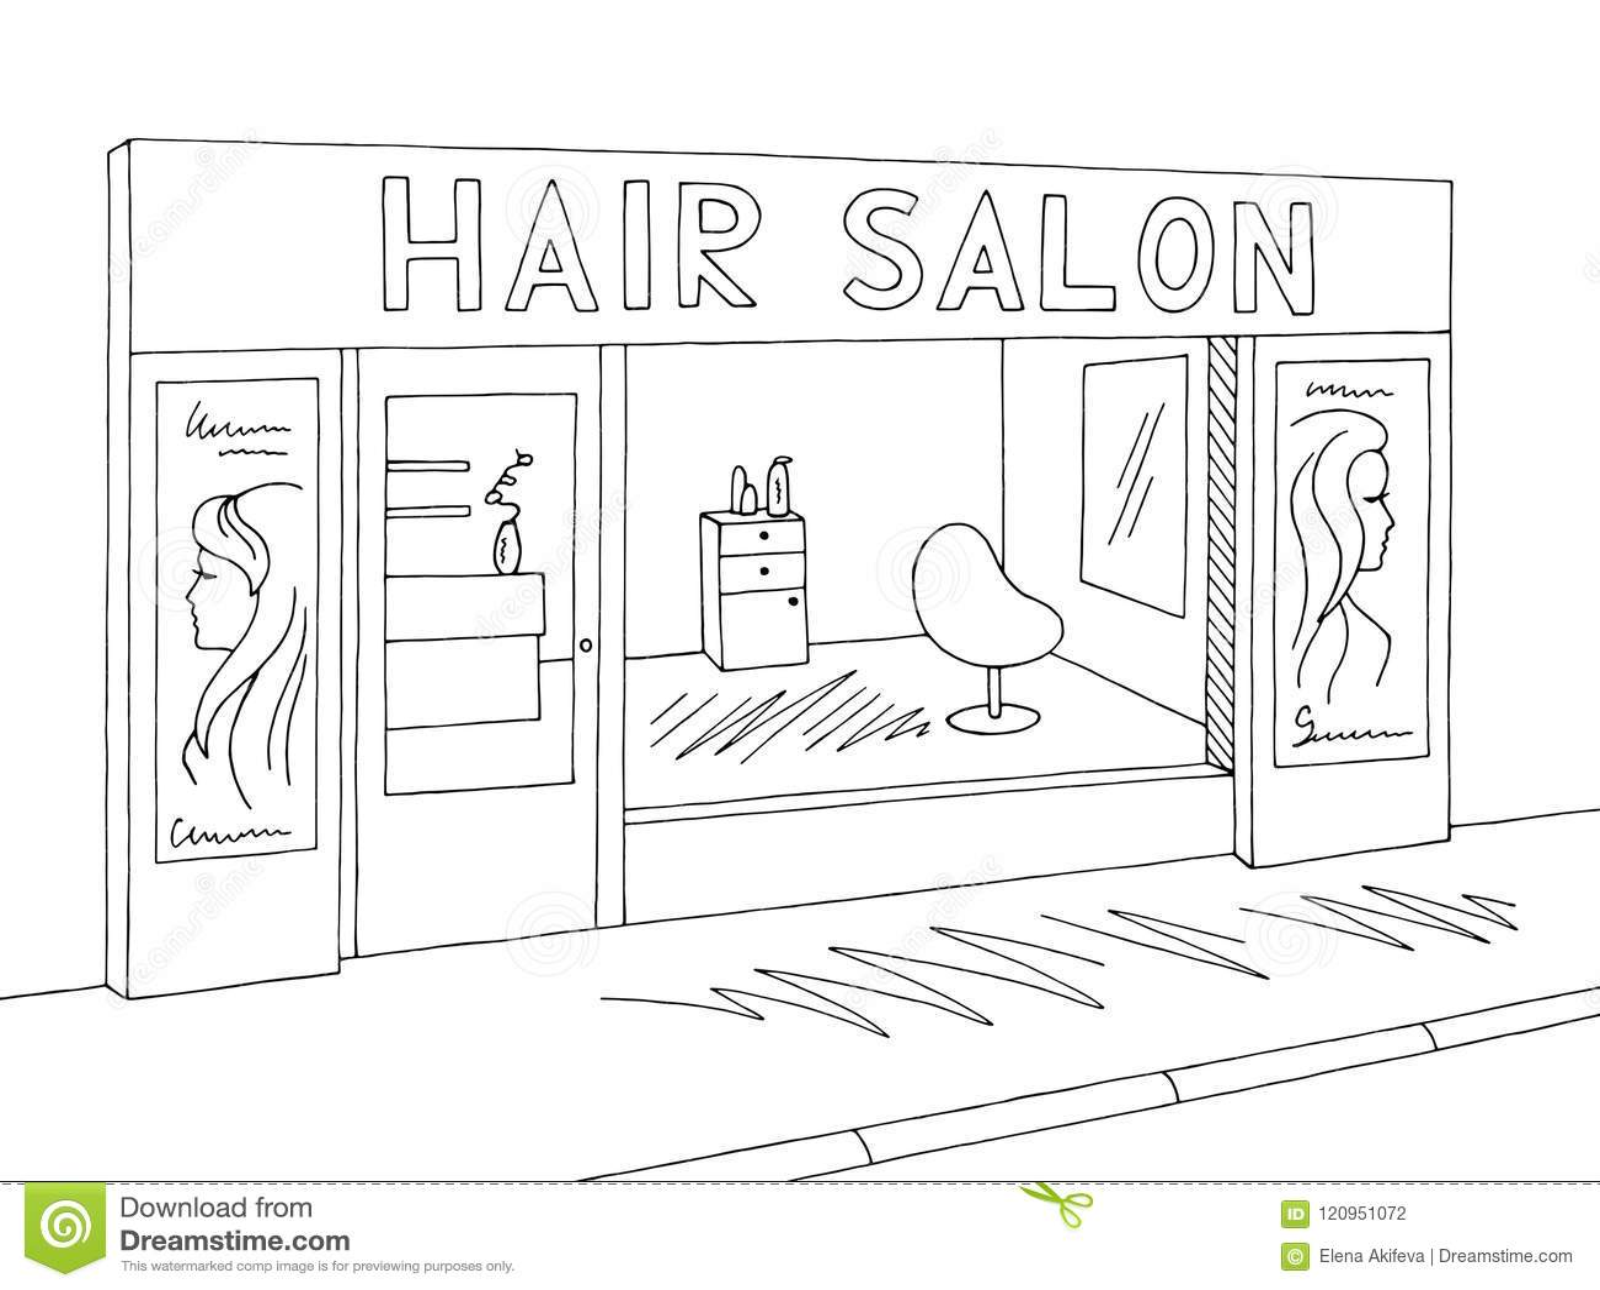 Hair Salon Exterior Graphic Black White Sketch